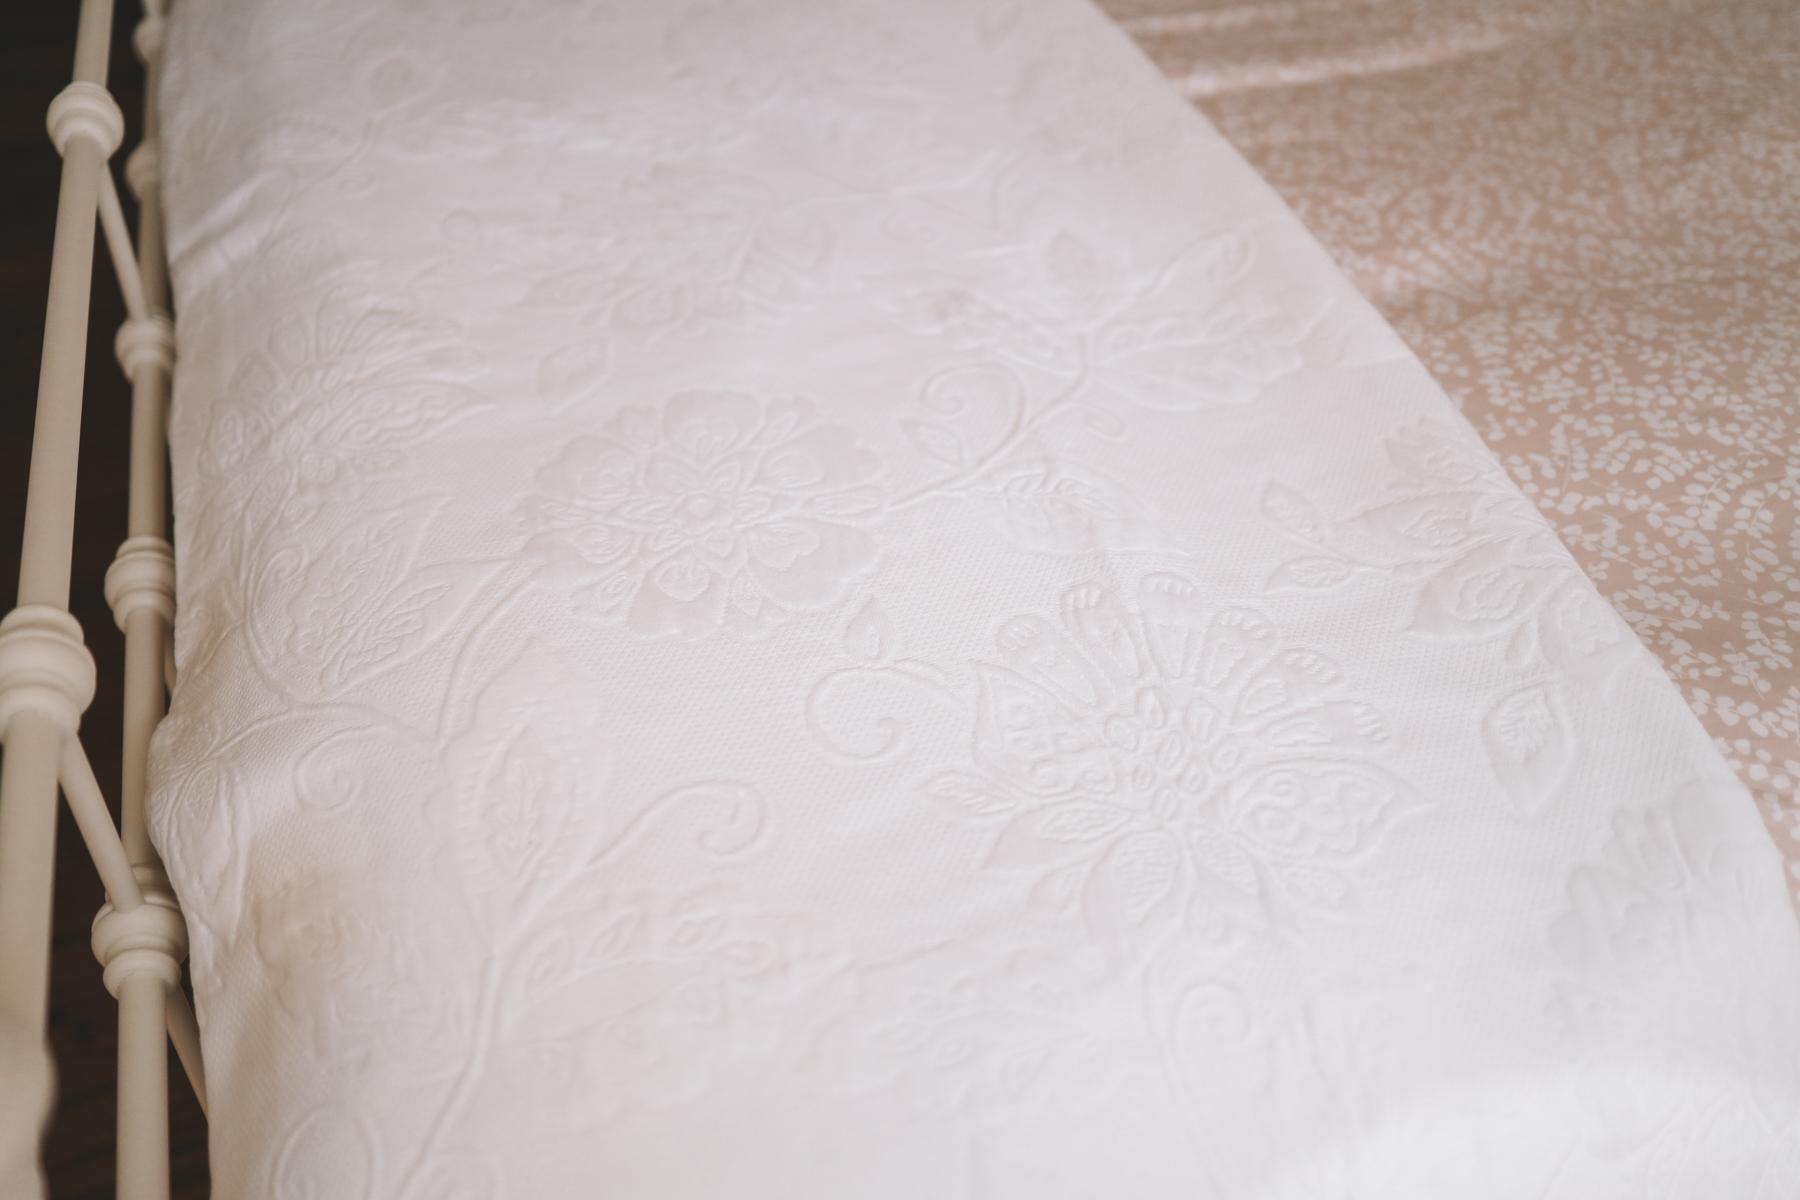 Birds-eye-view of white pillows on pink sheeds